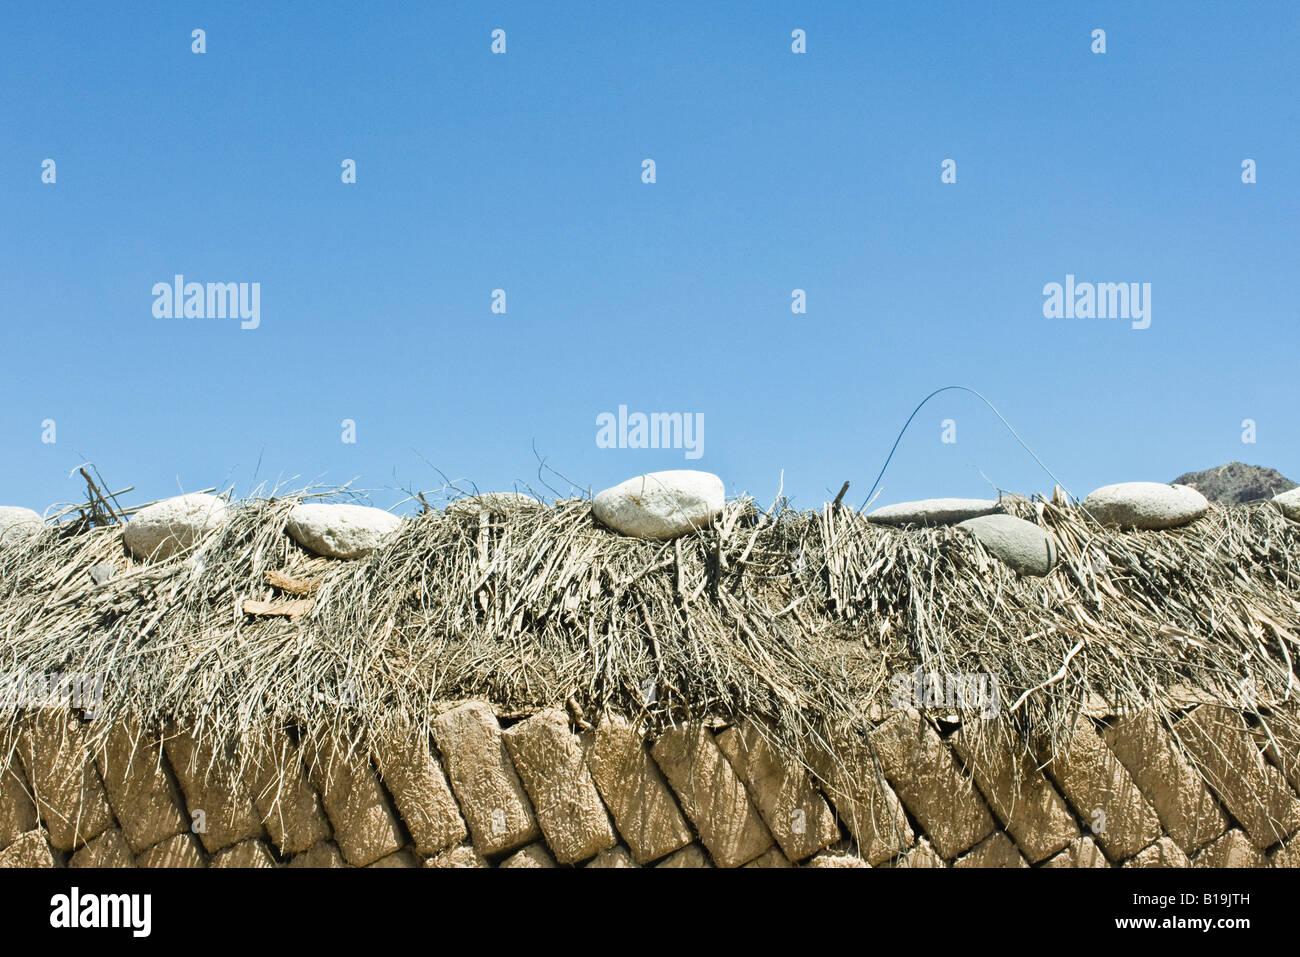 Thatching - Stock Image